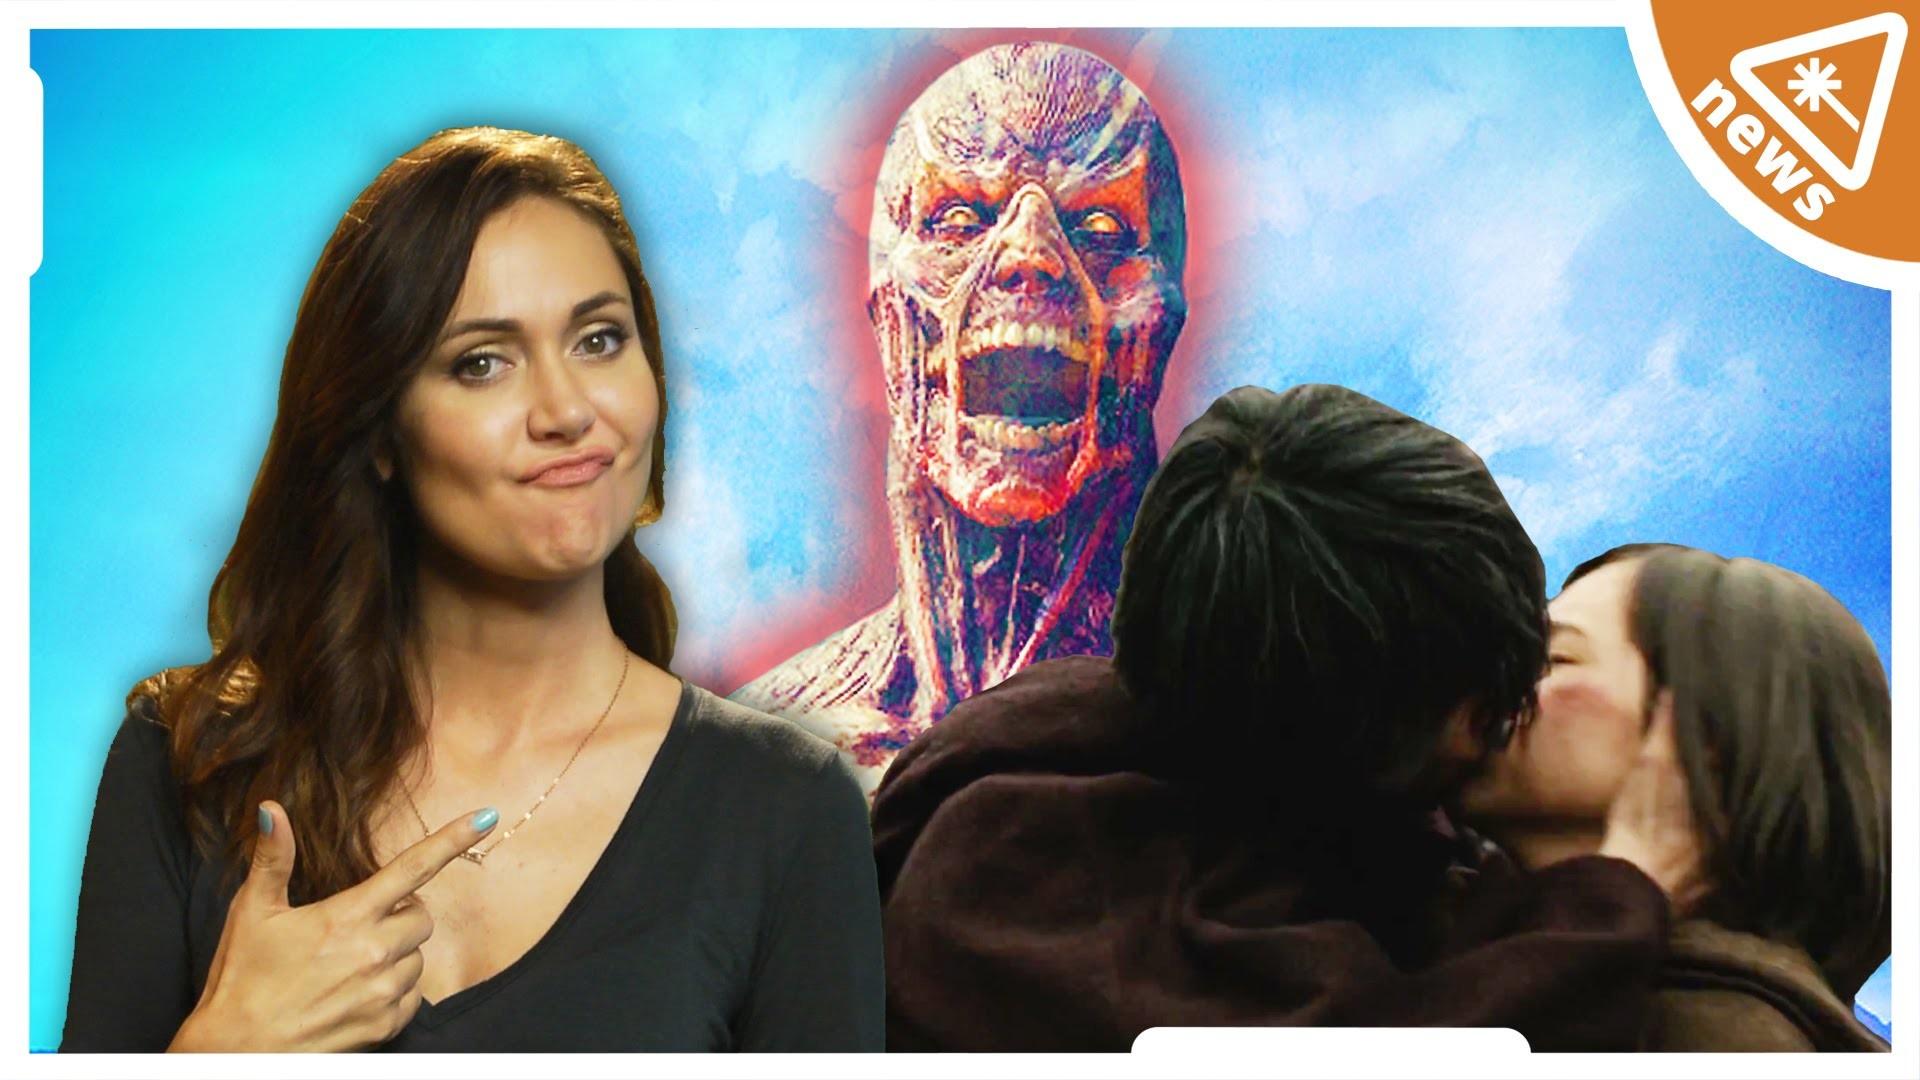 New ATTACK ON TITAN Trailer Controversy! (Nerdist News Report w/ Jessica  Chobot) – YouTube